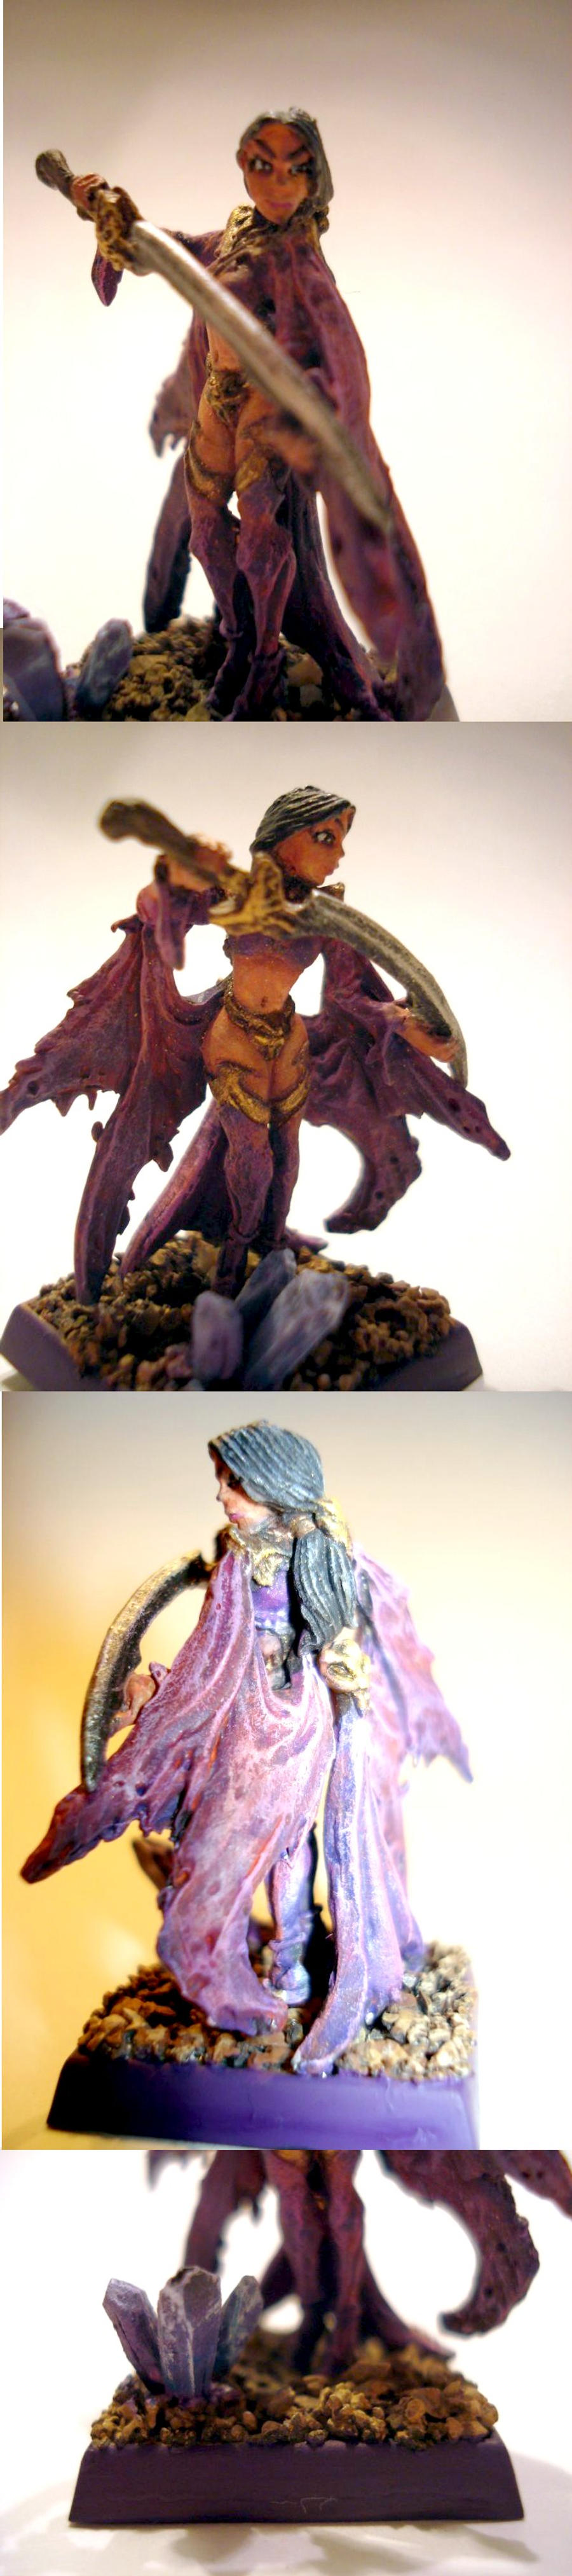 Theda, Priestess by MoCaW